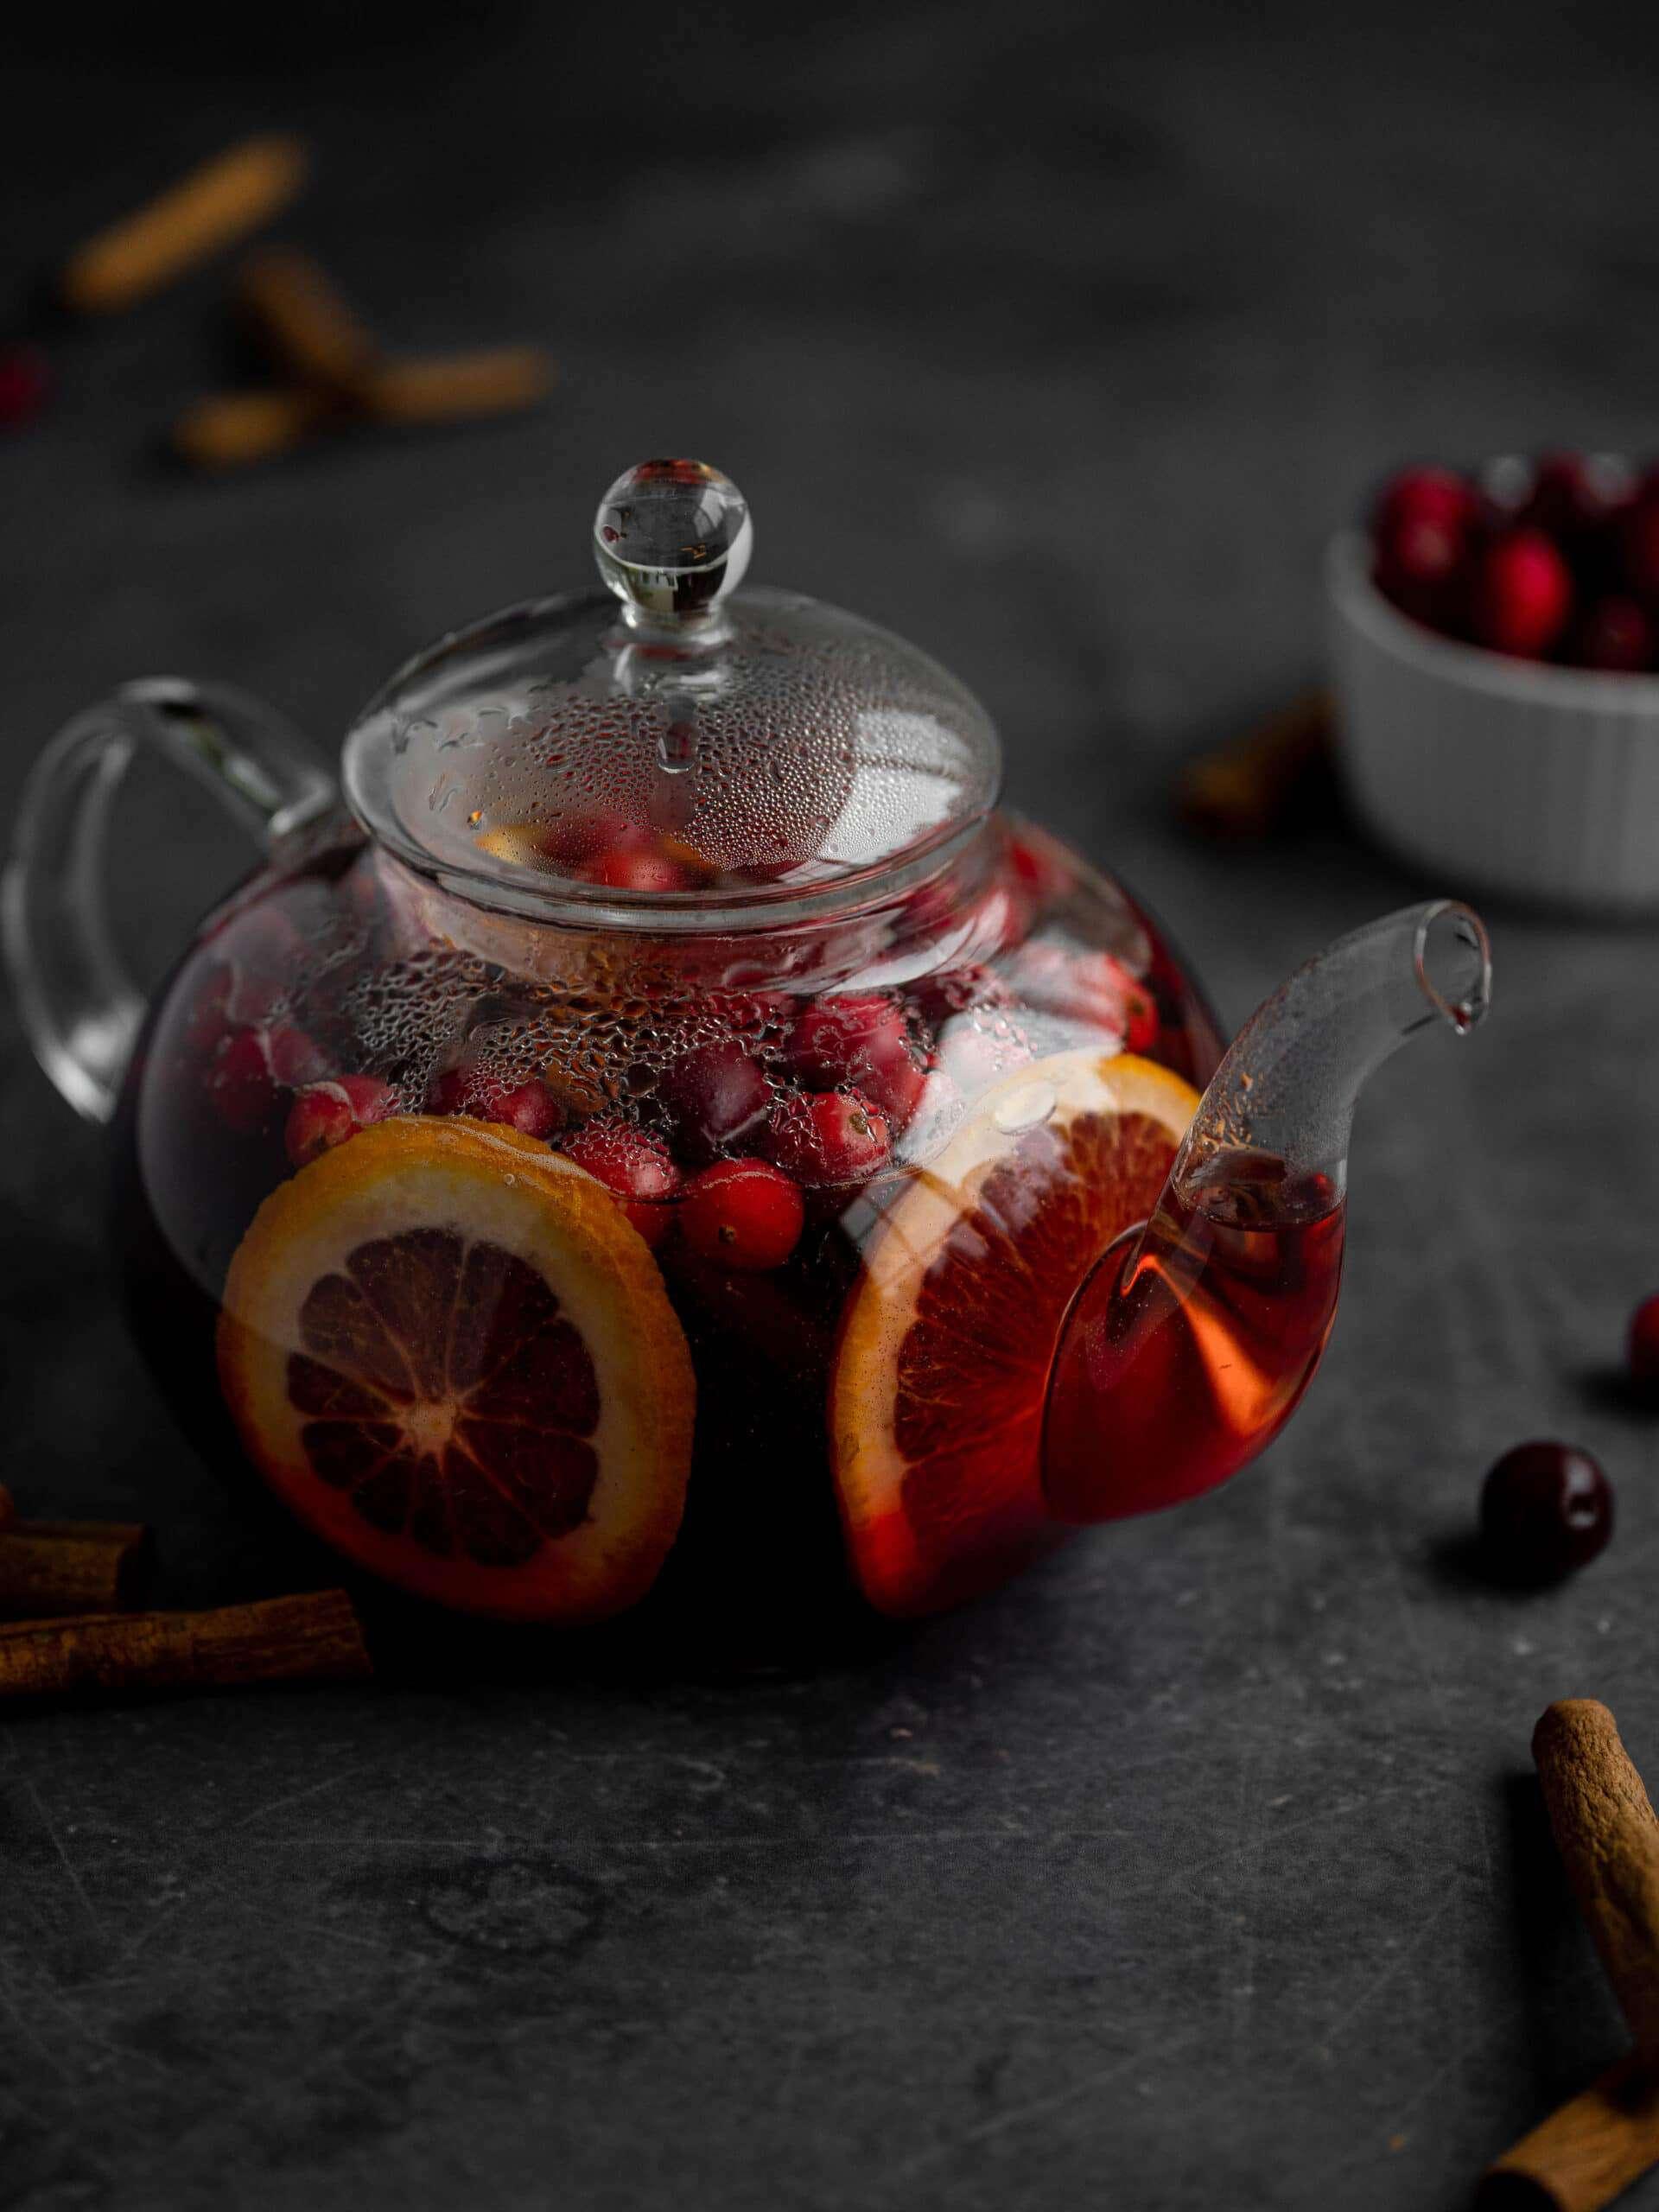 A citrus cranberry tea in a glass teapot